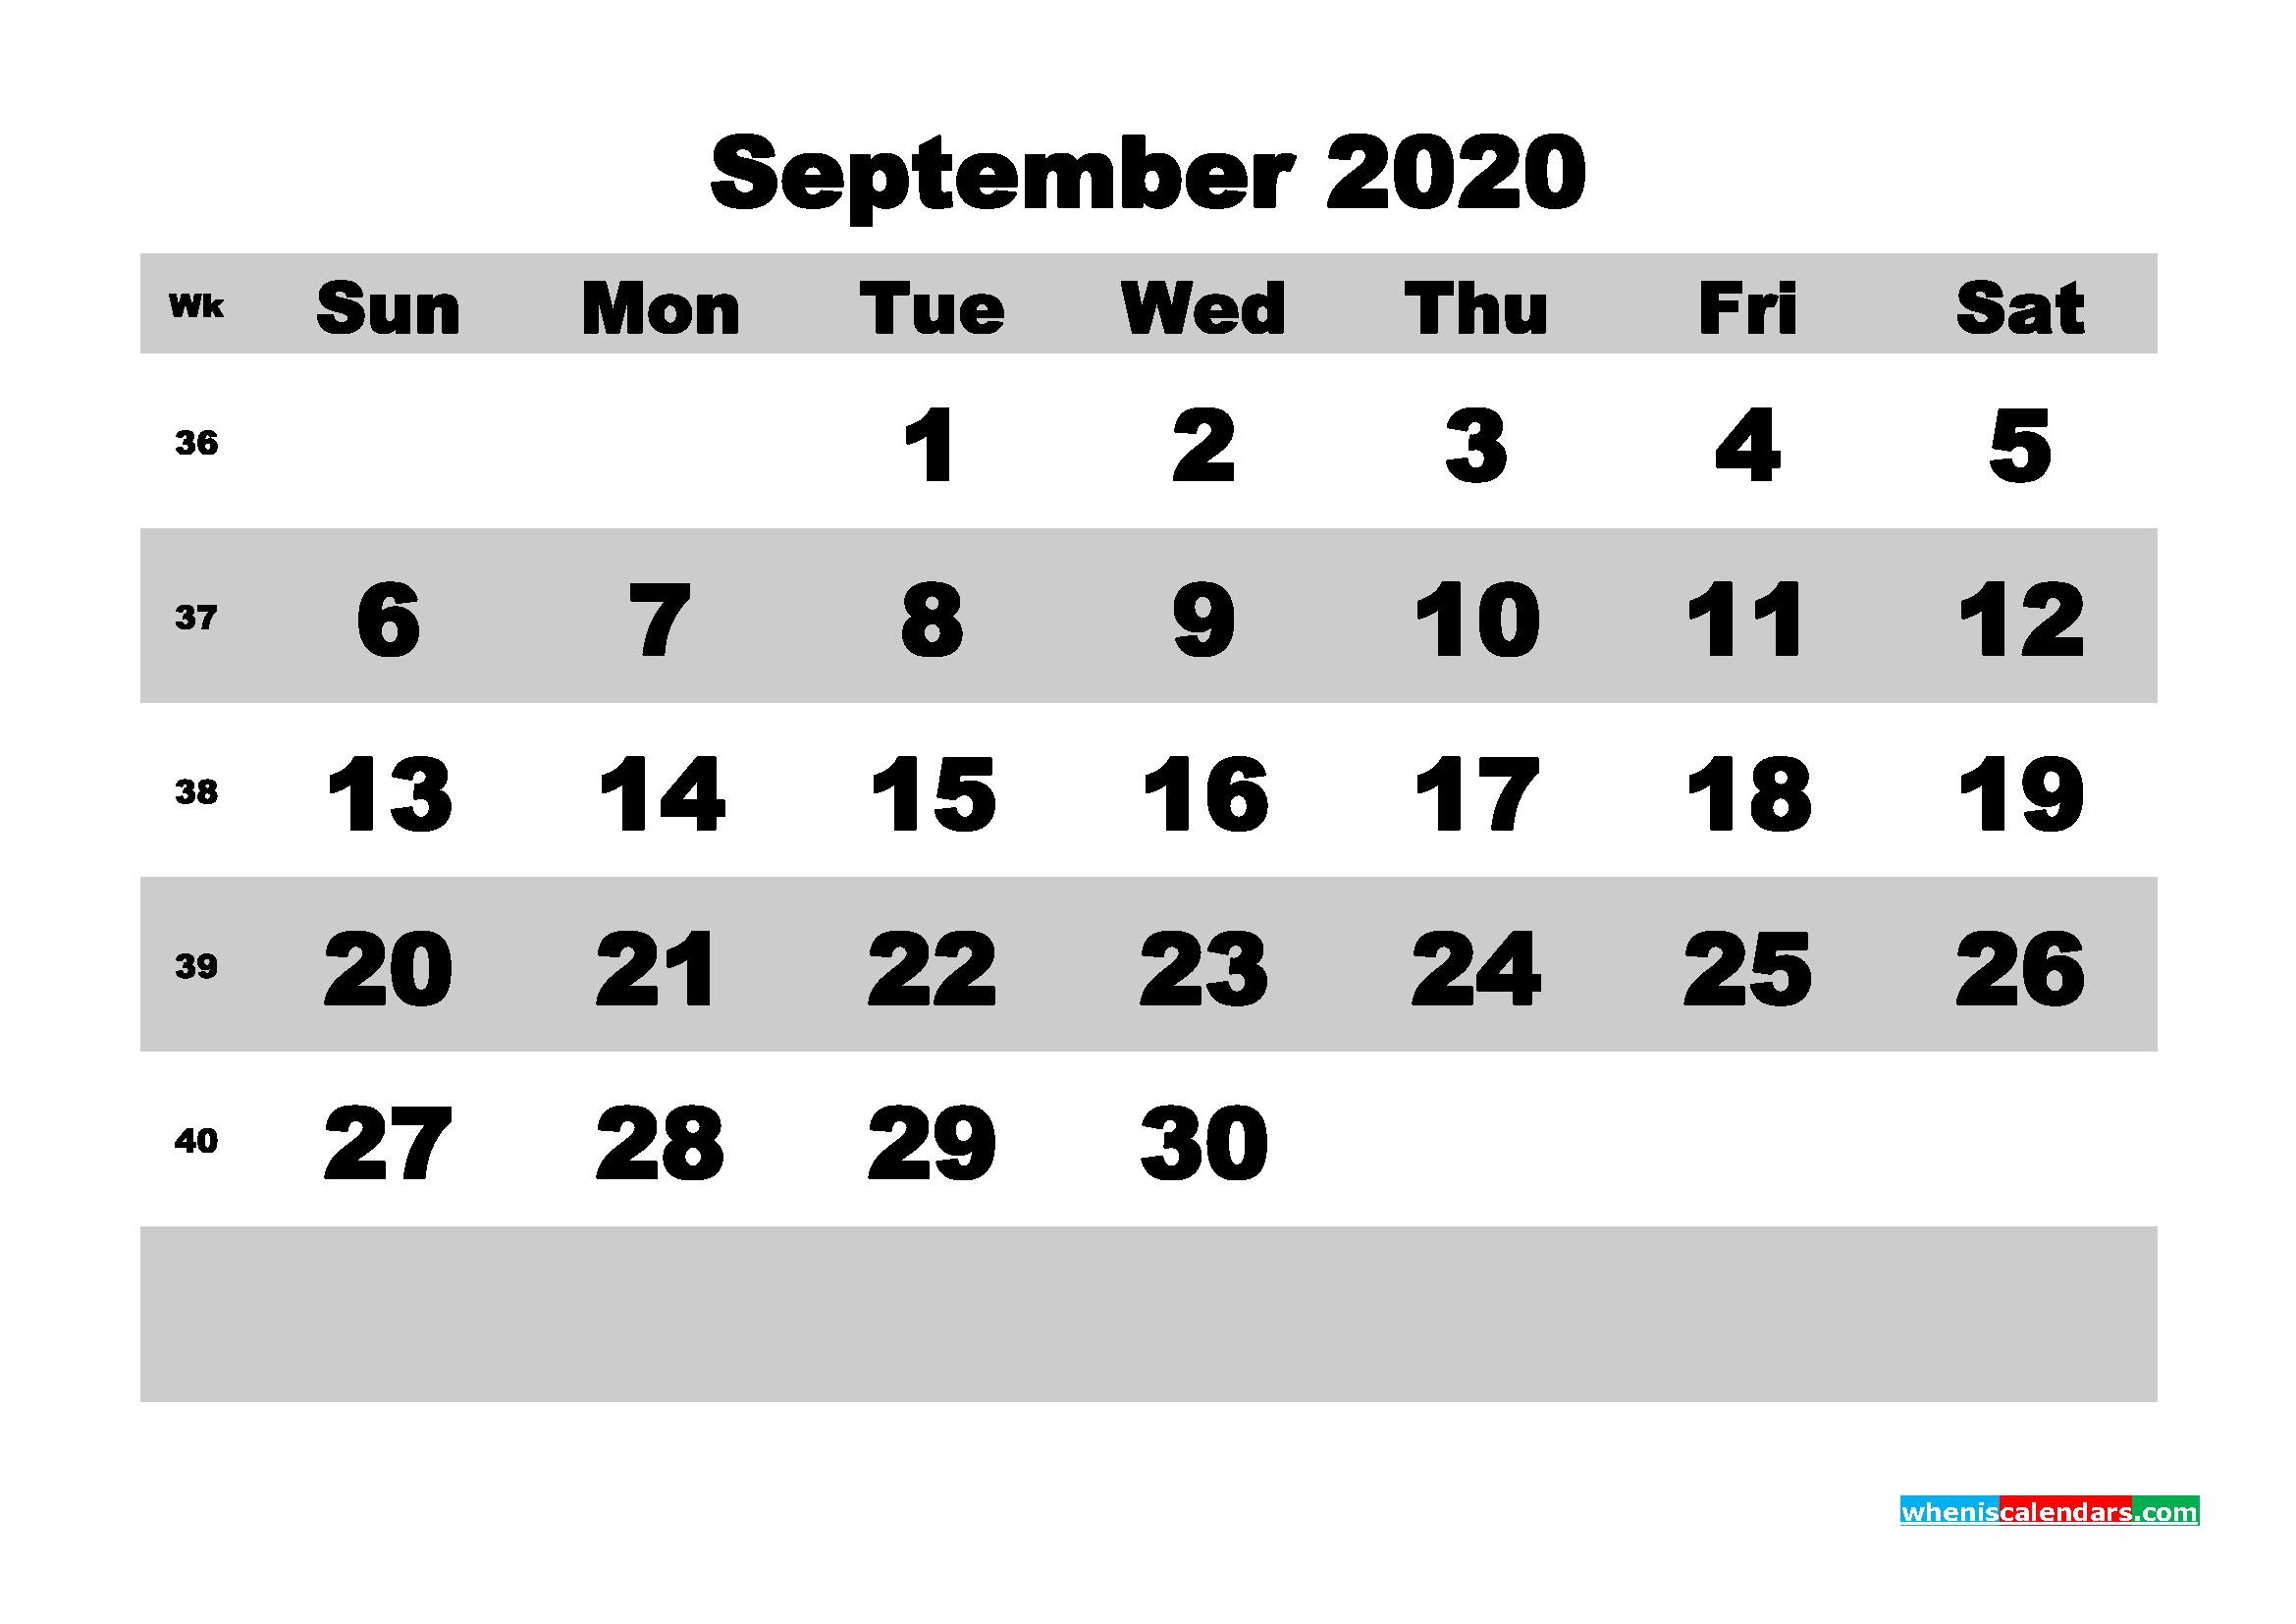 September Printable Calendar 2020 PDF, Word - No.m20b597